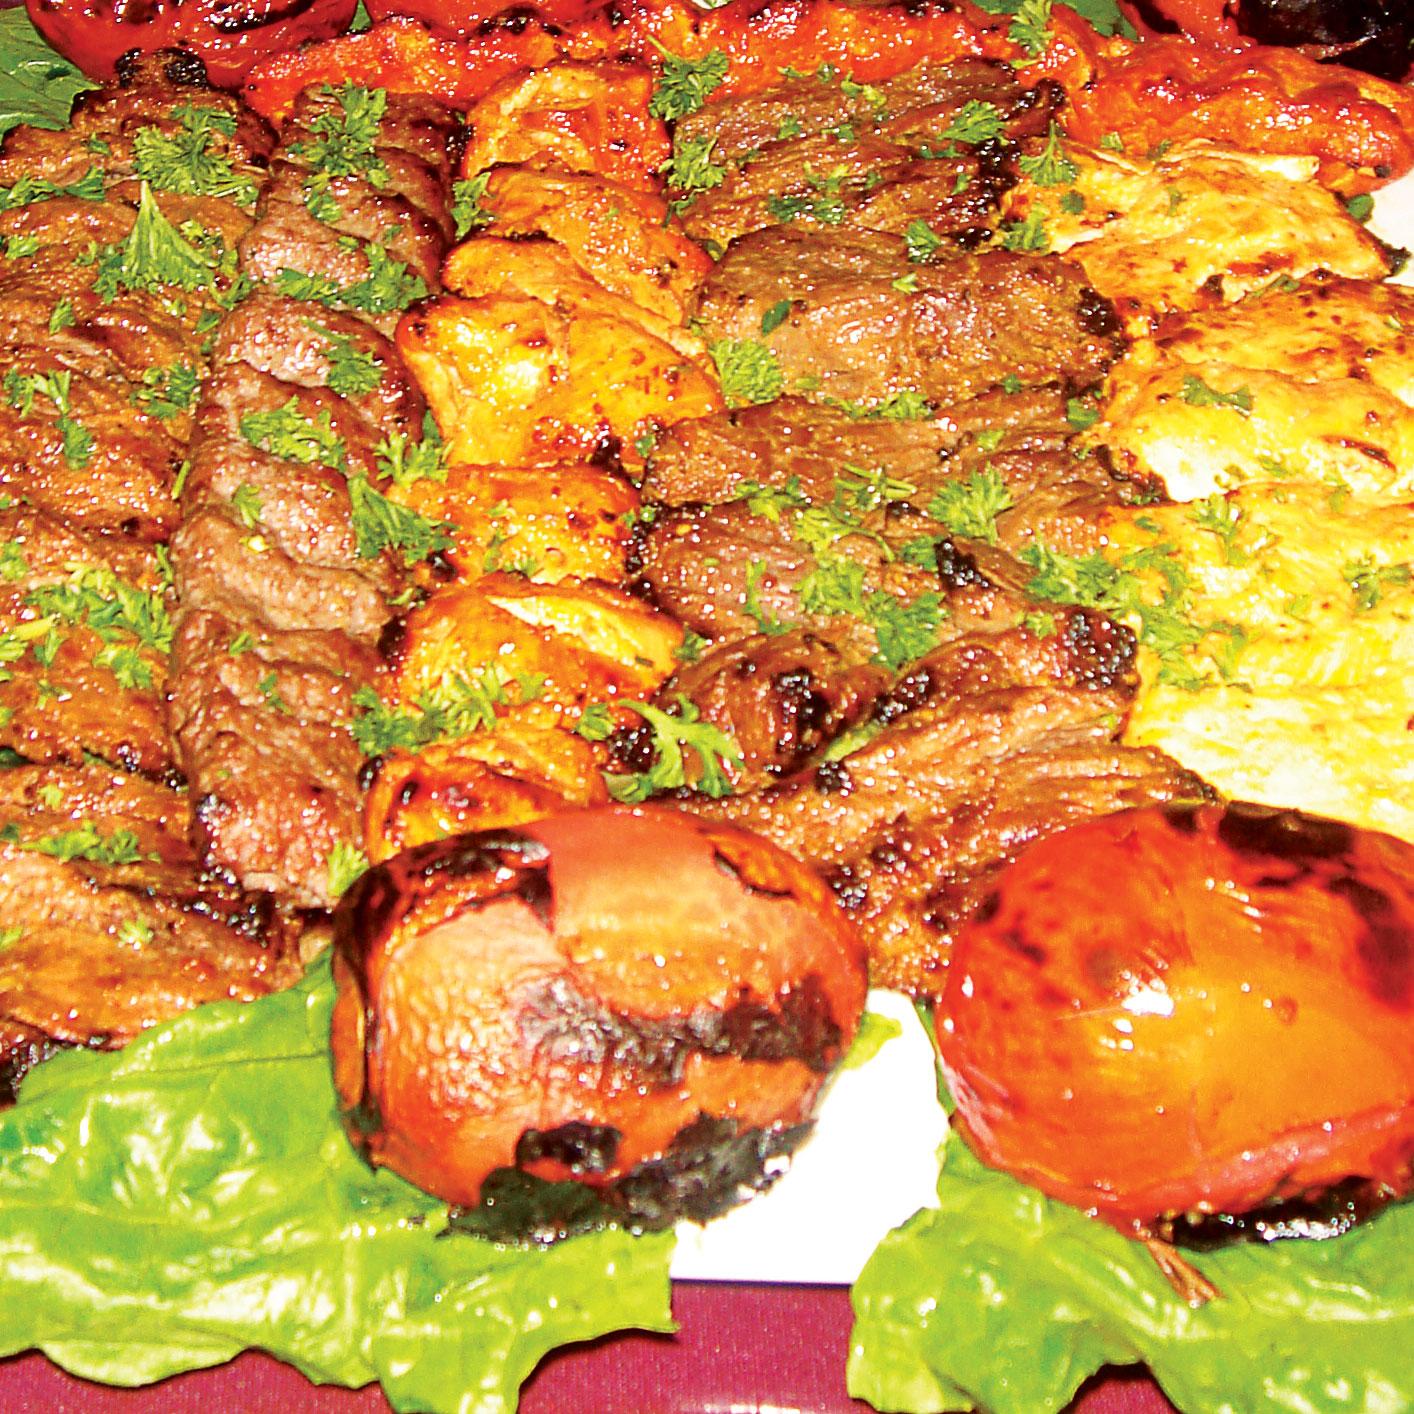 Ava persian mediterranean cuisine gentlemens guide la for About mediterranean cuisine